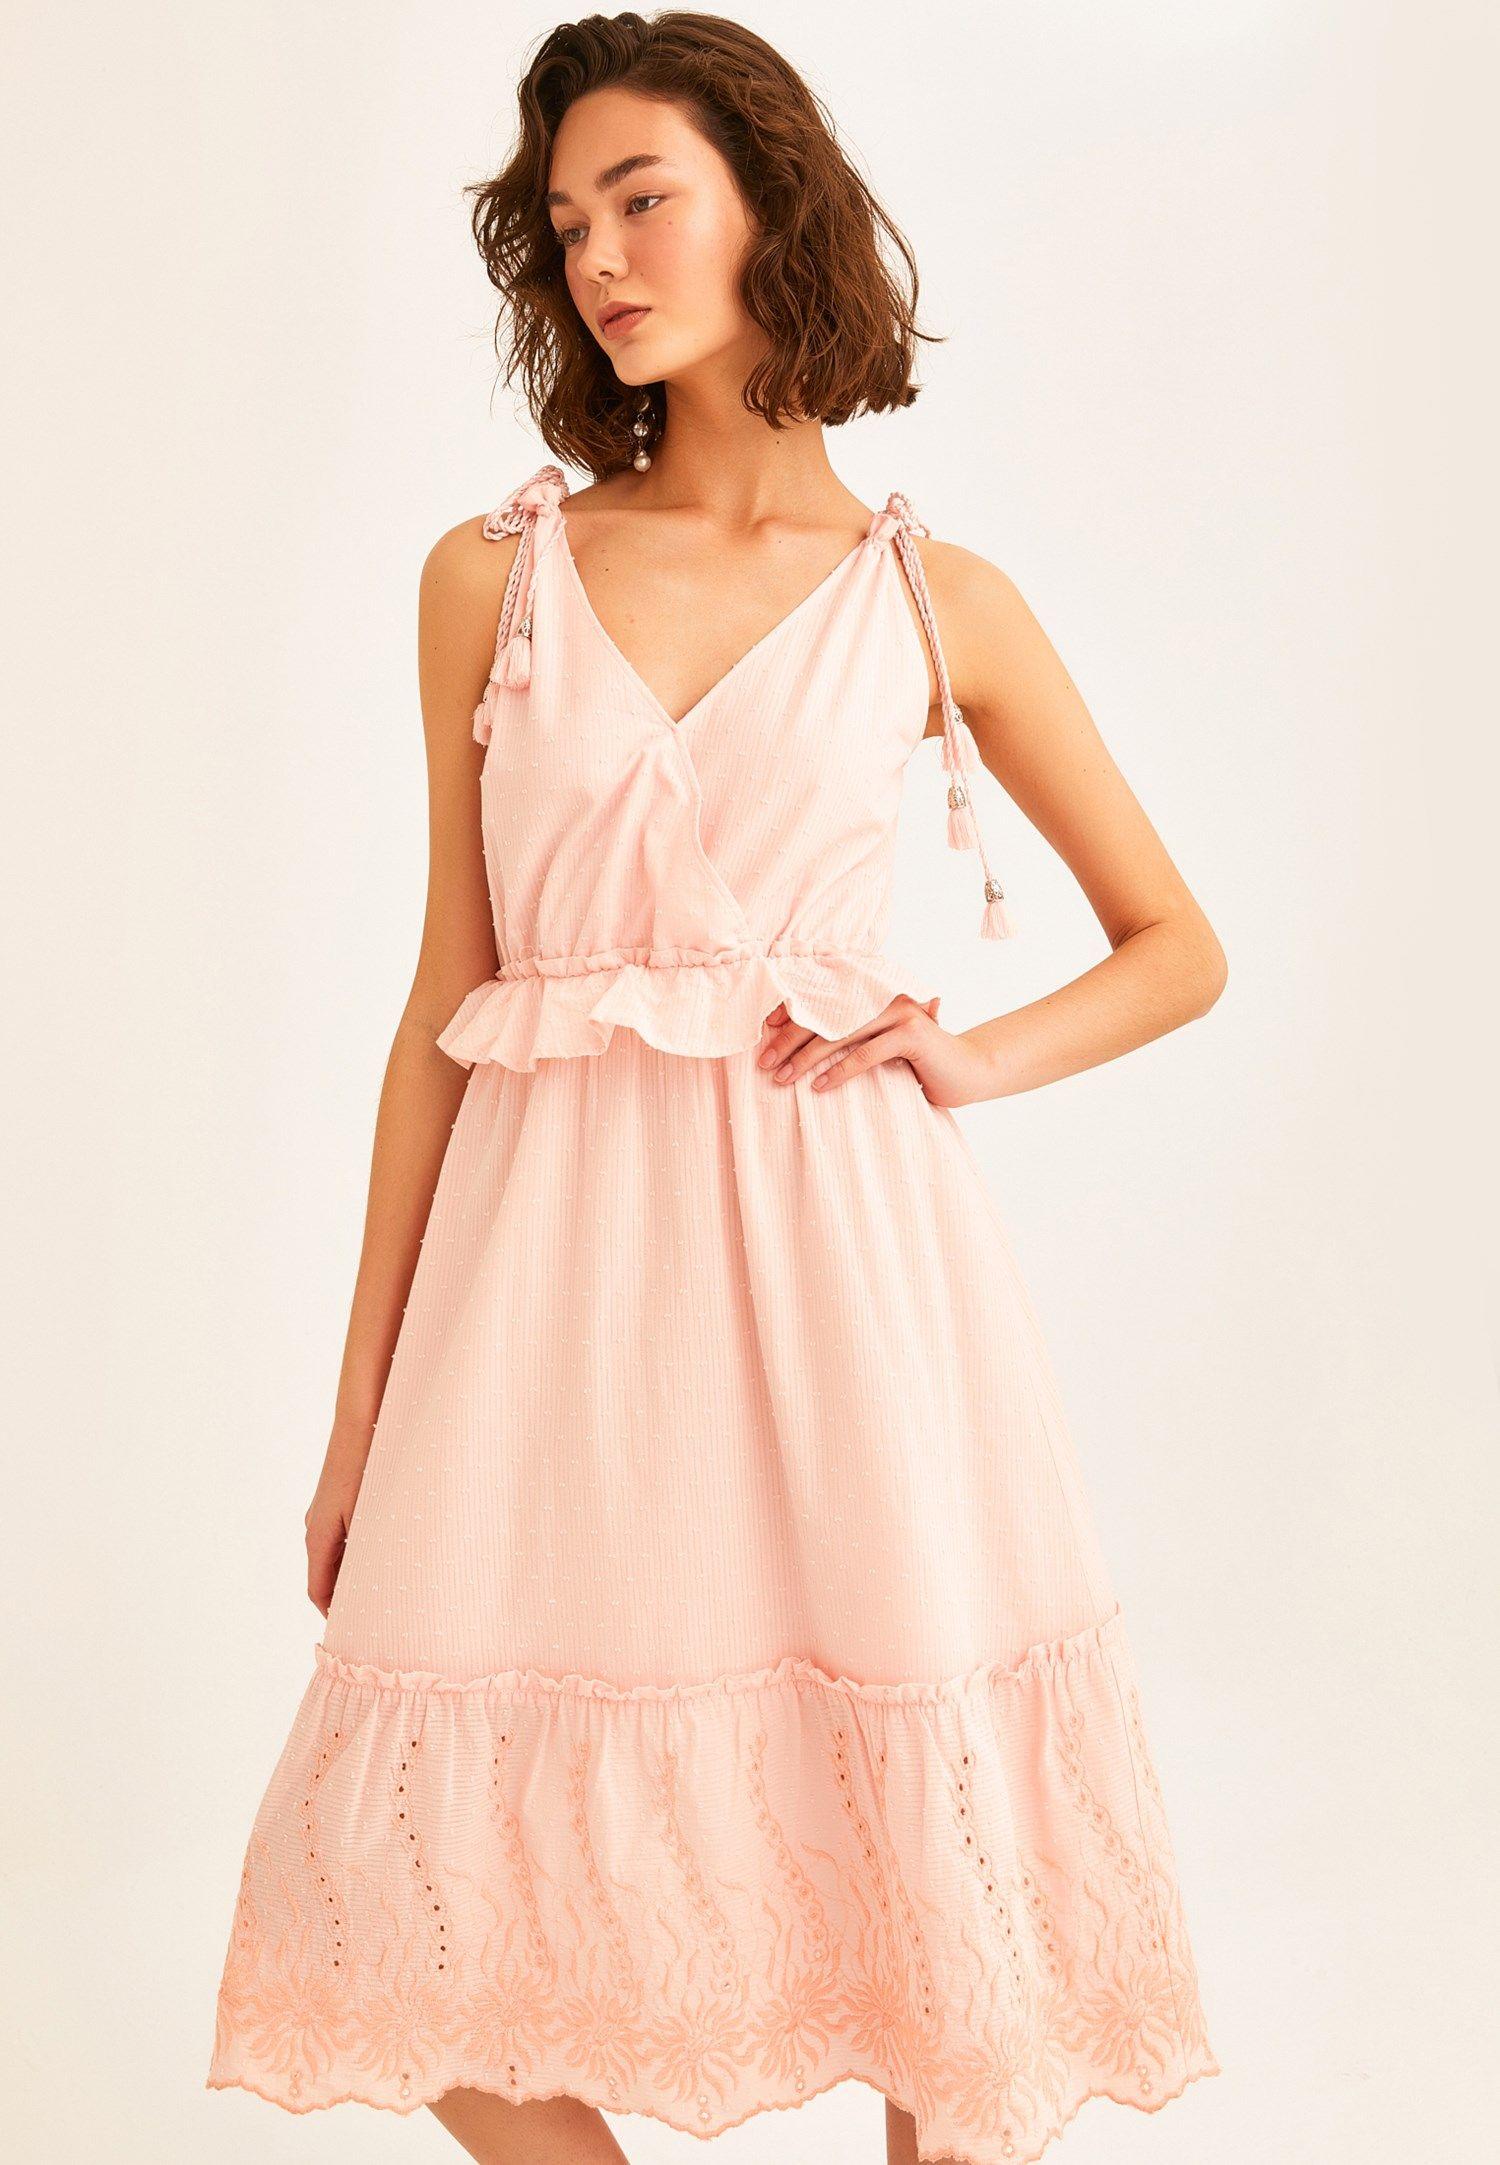 Pembe Kruvaze Yaka Detayli Midi Boy Elbise Online Alisveris 20yox Pamrodel Oxxo 2020 Elbise The Dress Midi Elbise